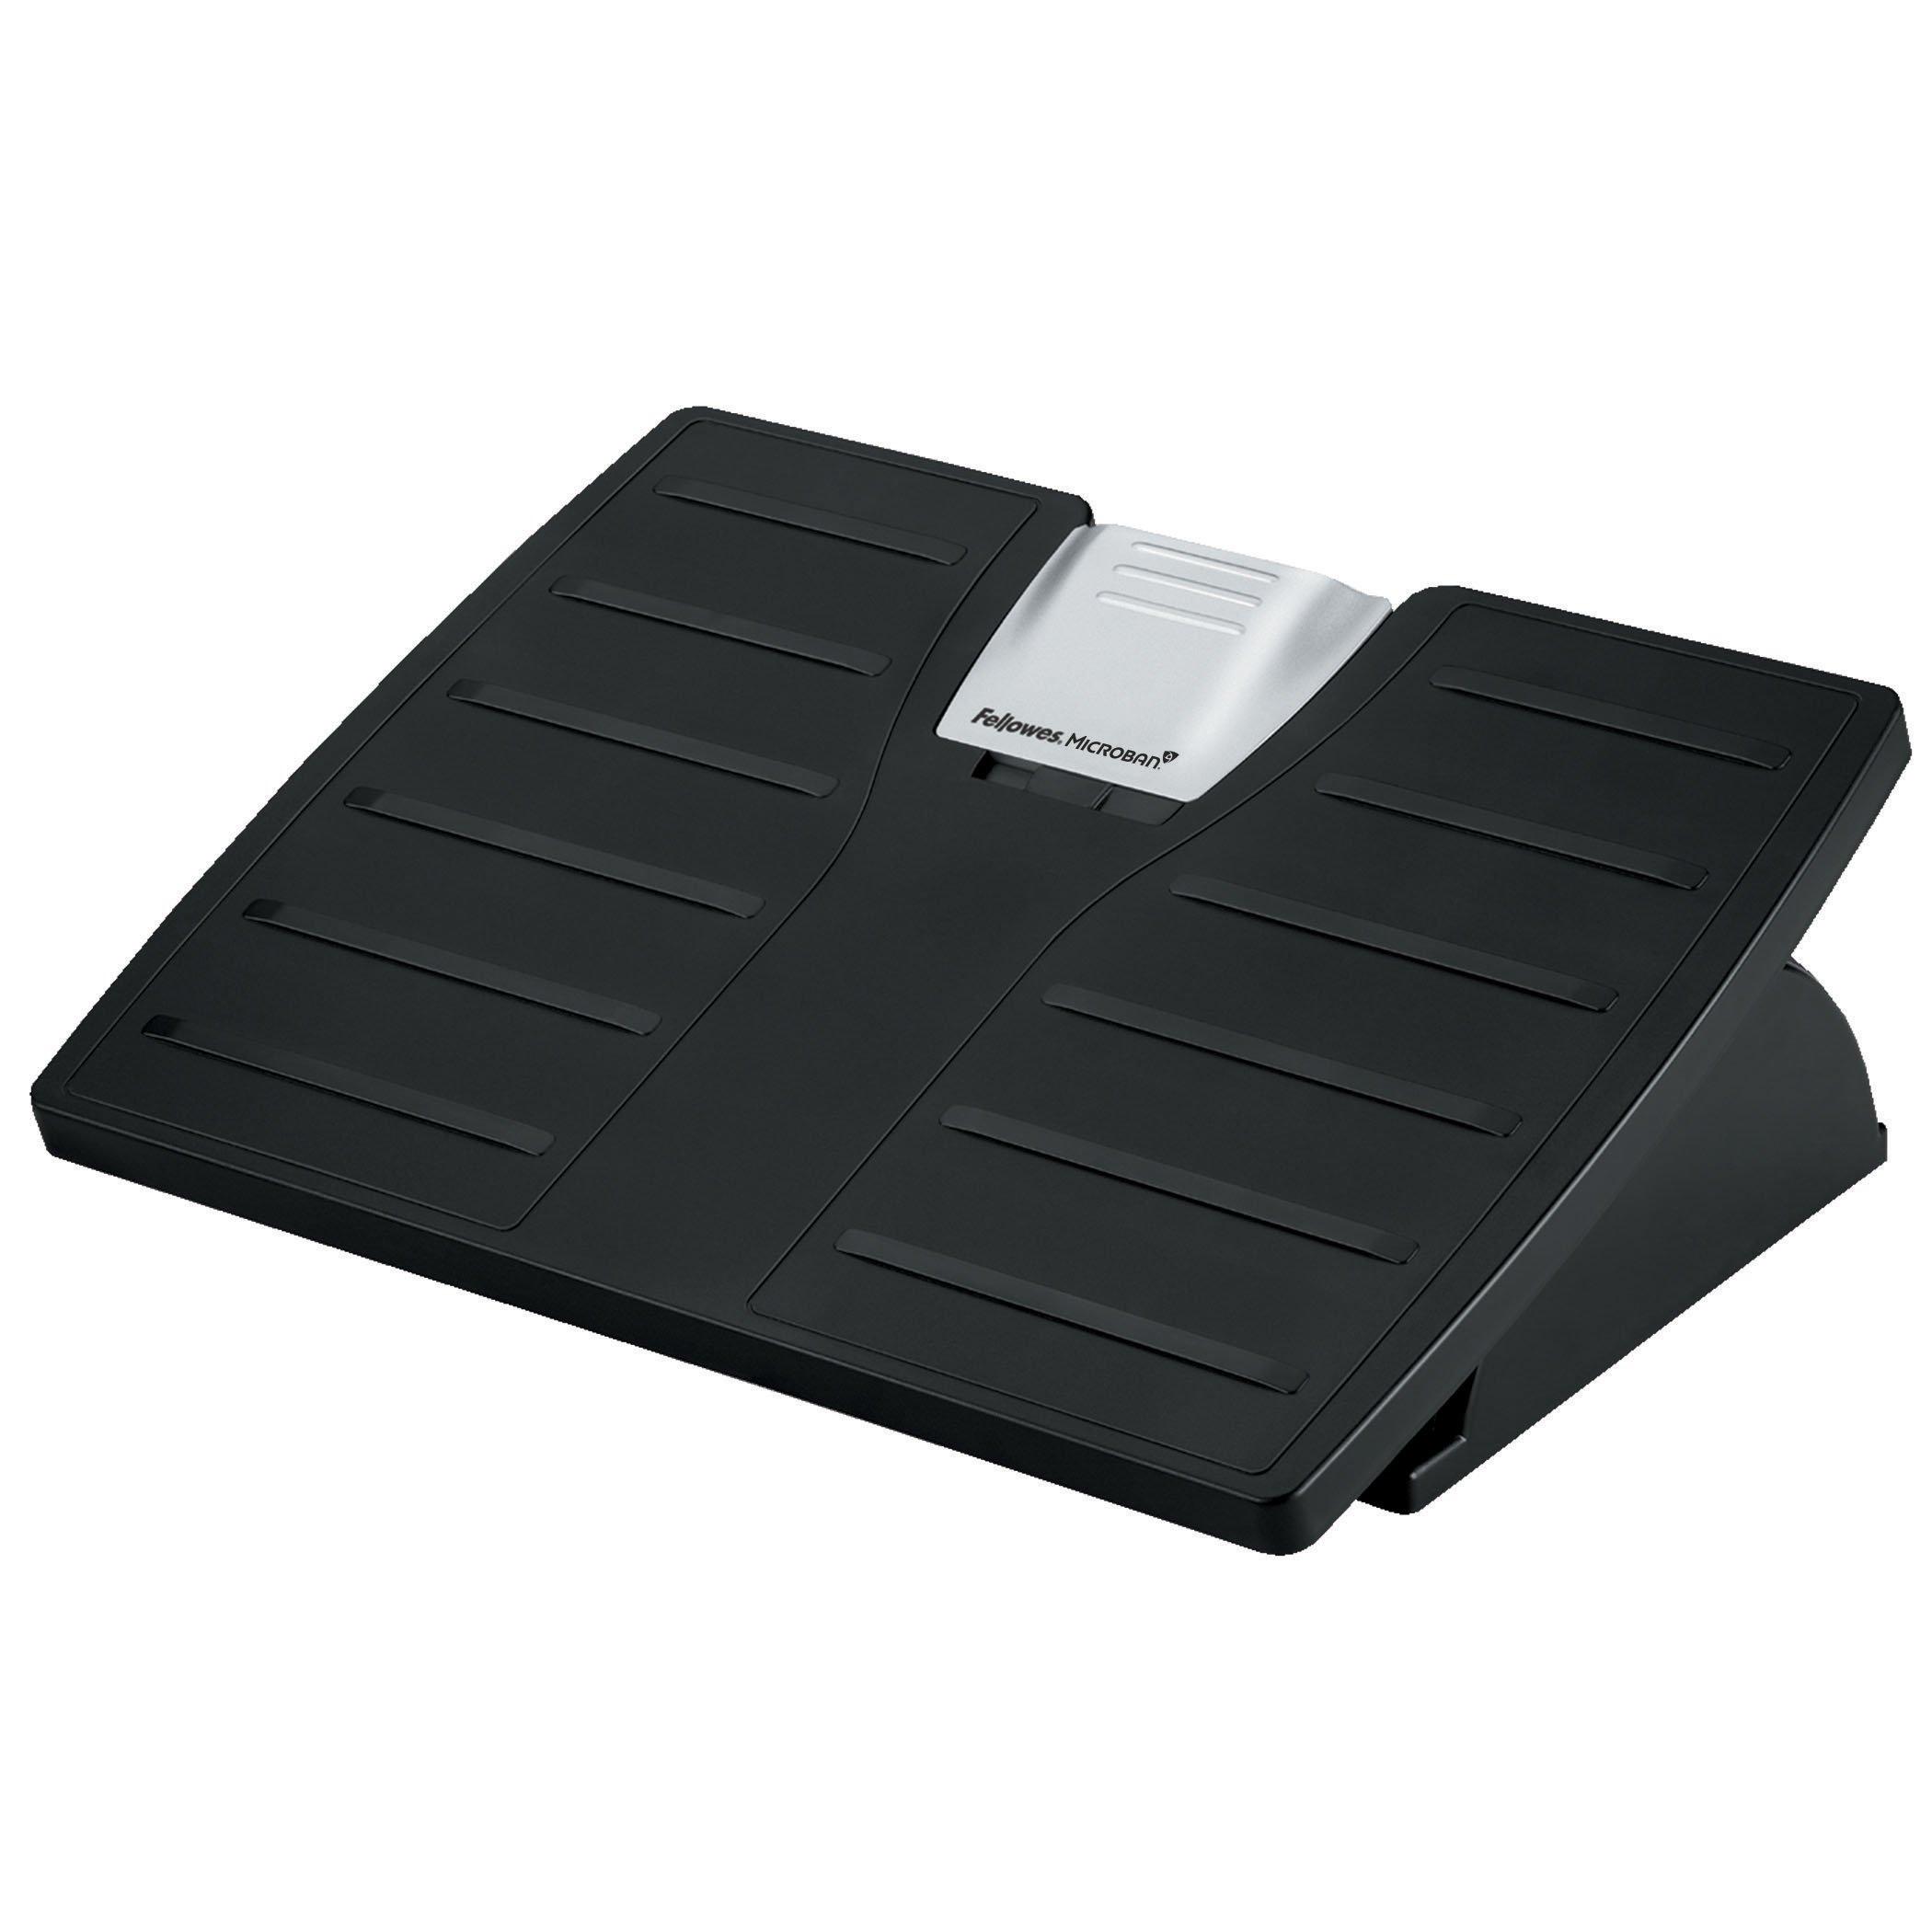 Fellowes 8035001 Adjustable Locking Footrest w/Microban, 17 1/2 x 13 1/8 x 5 5/8, Black/Silver by Fellowes